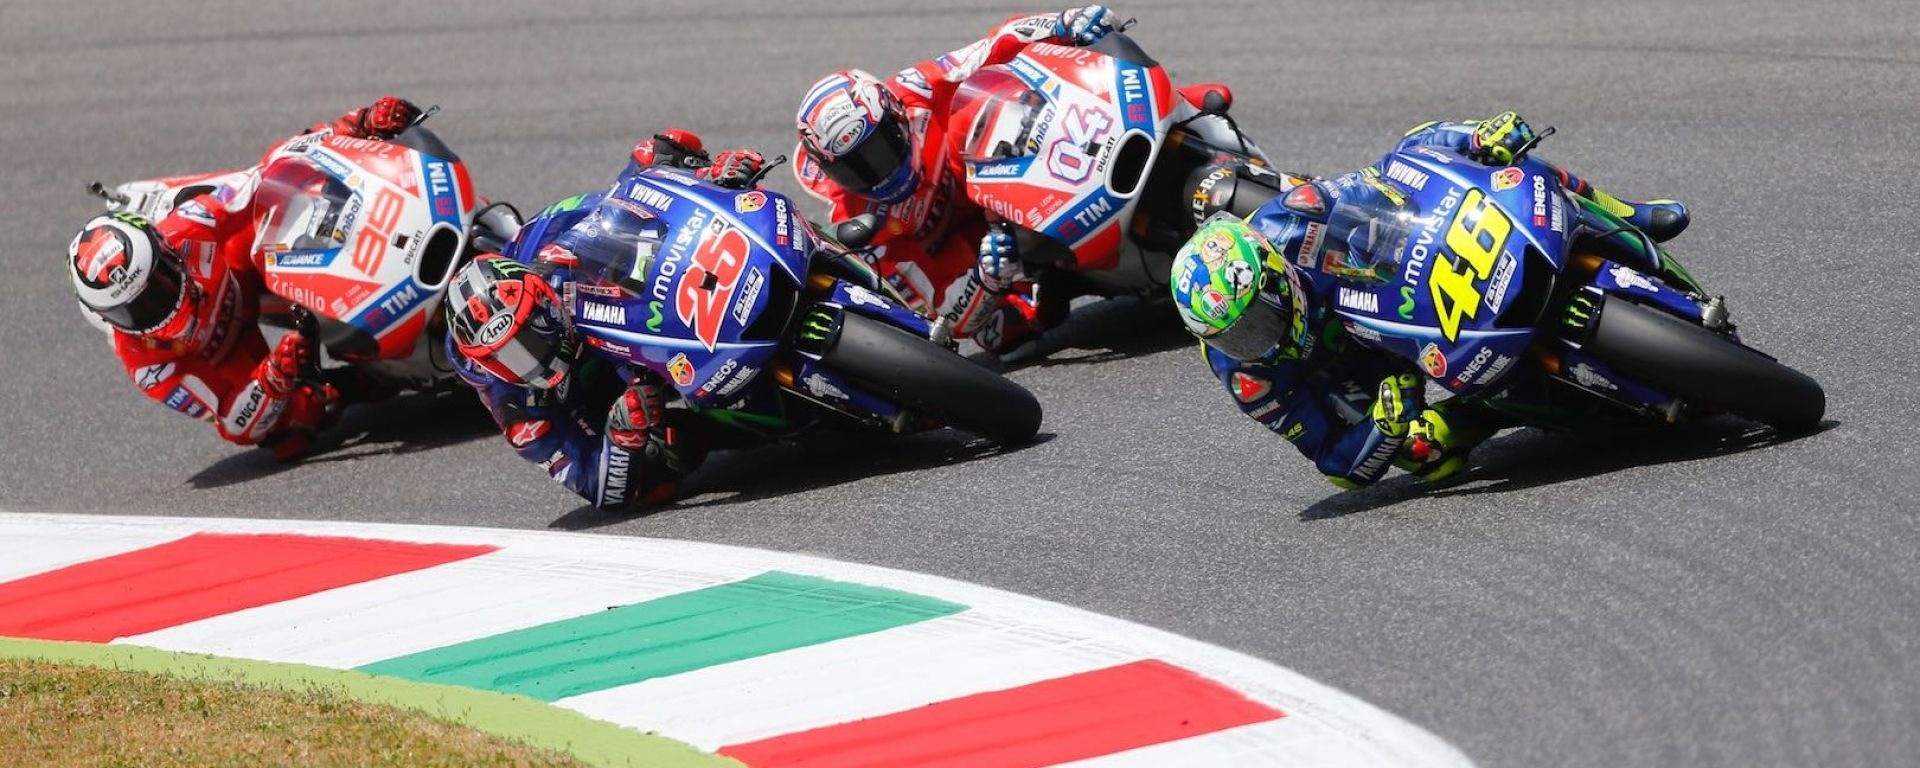 Test MotoGP 2018